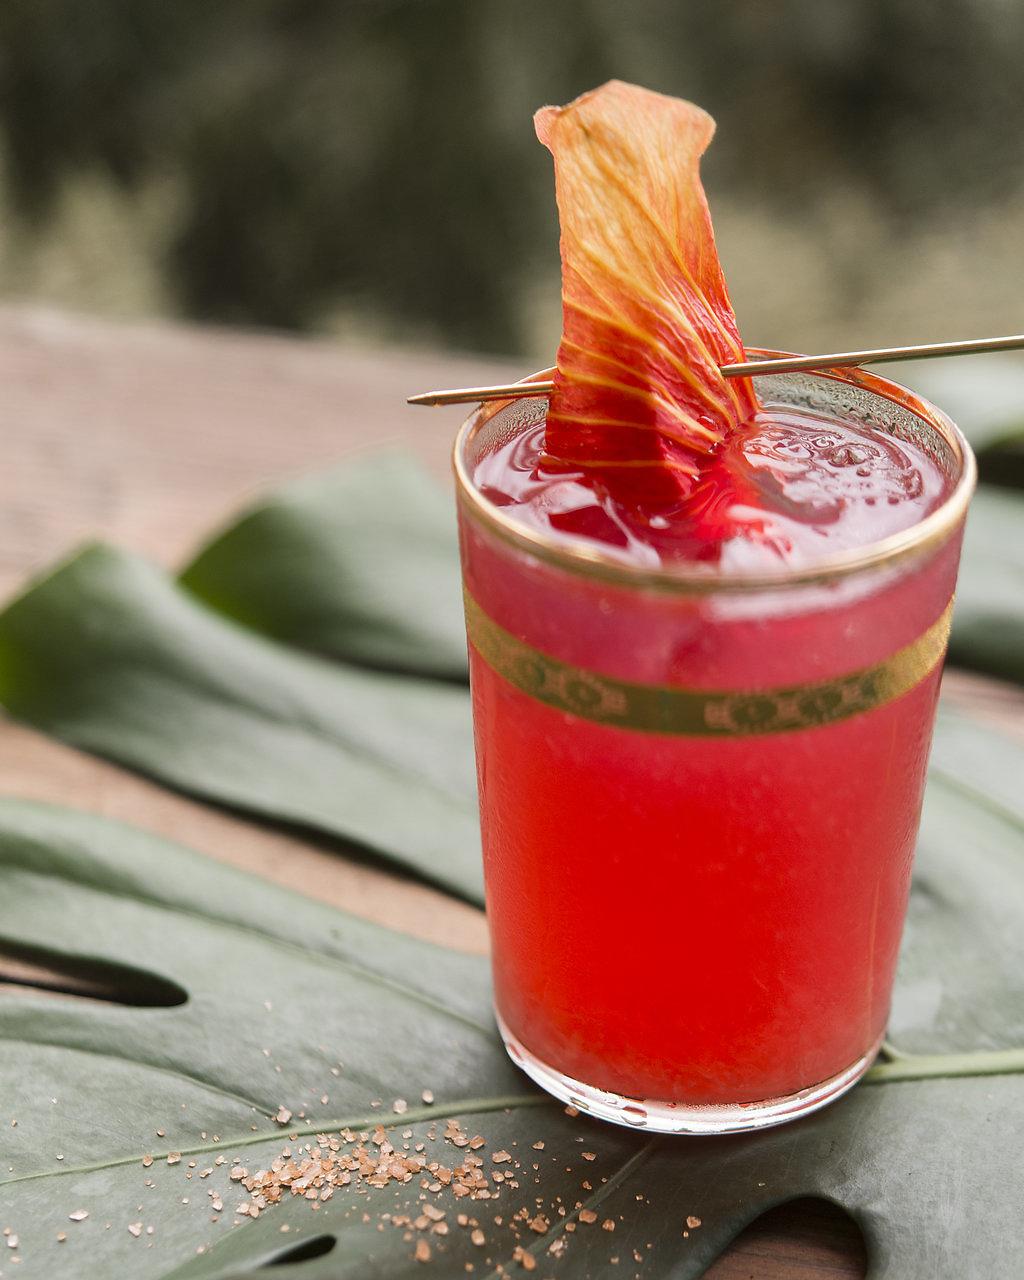 ALO'ALO   fresh pressed lime, house hibiscus syrup, hawaiian sea salt, reposado tequila